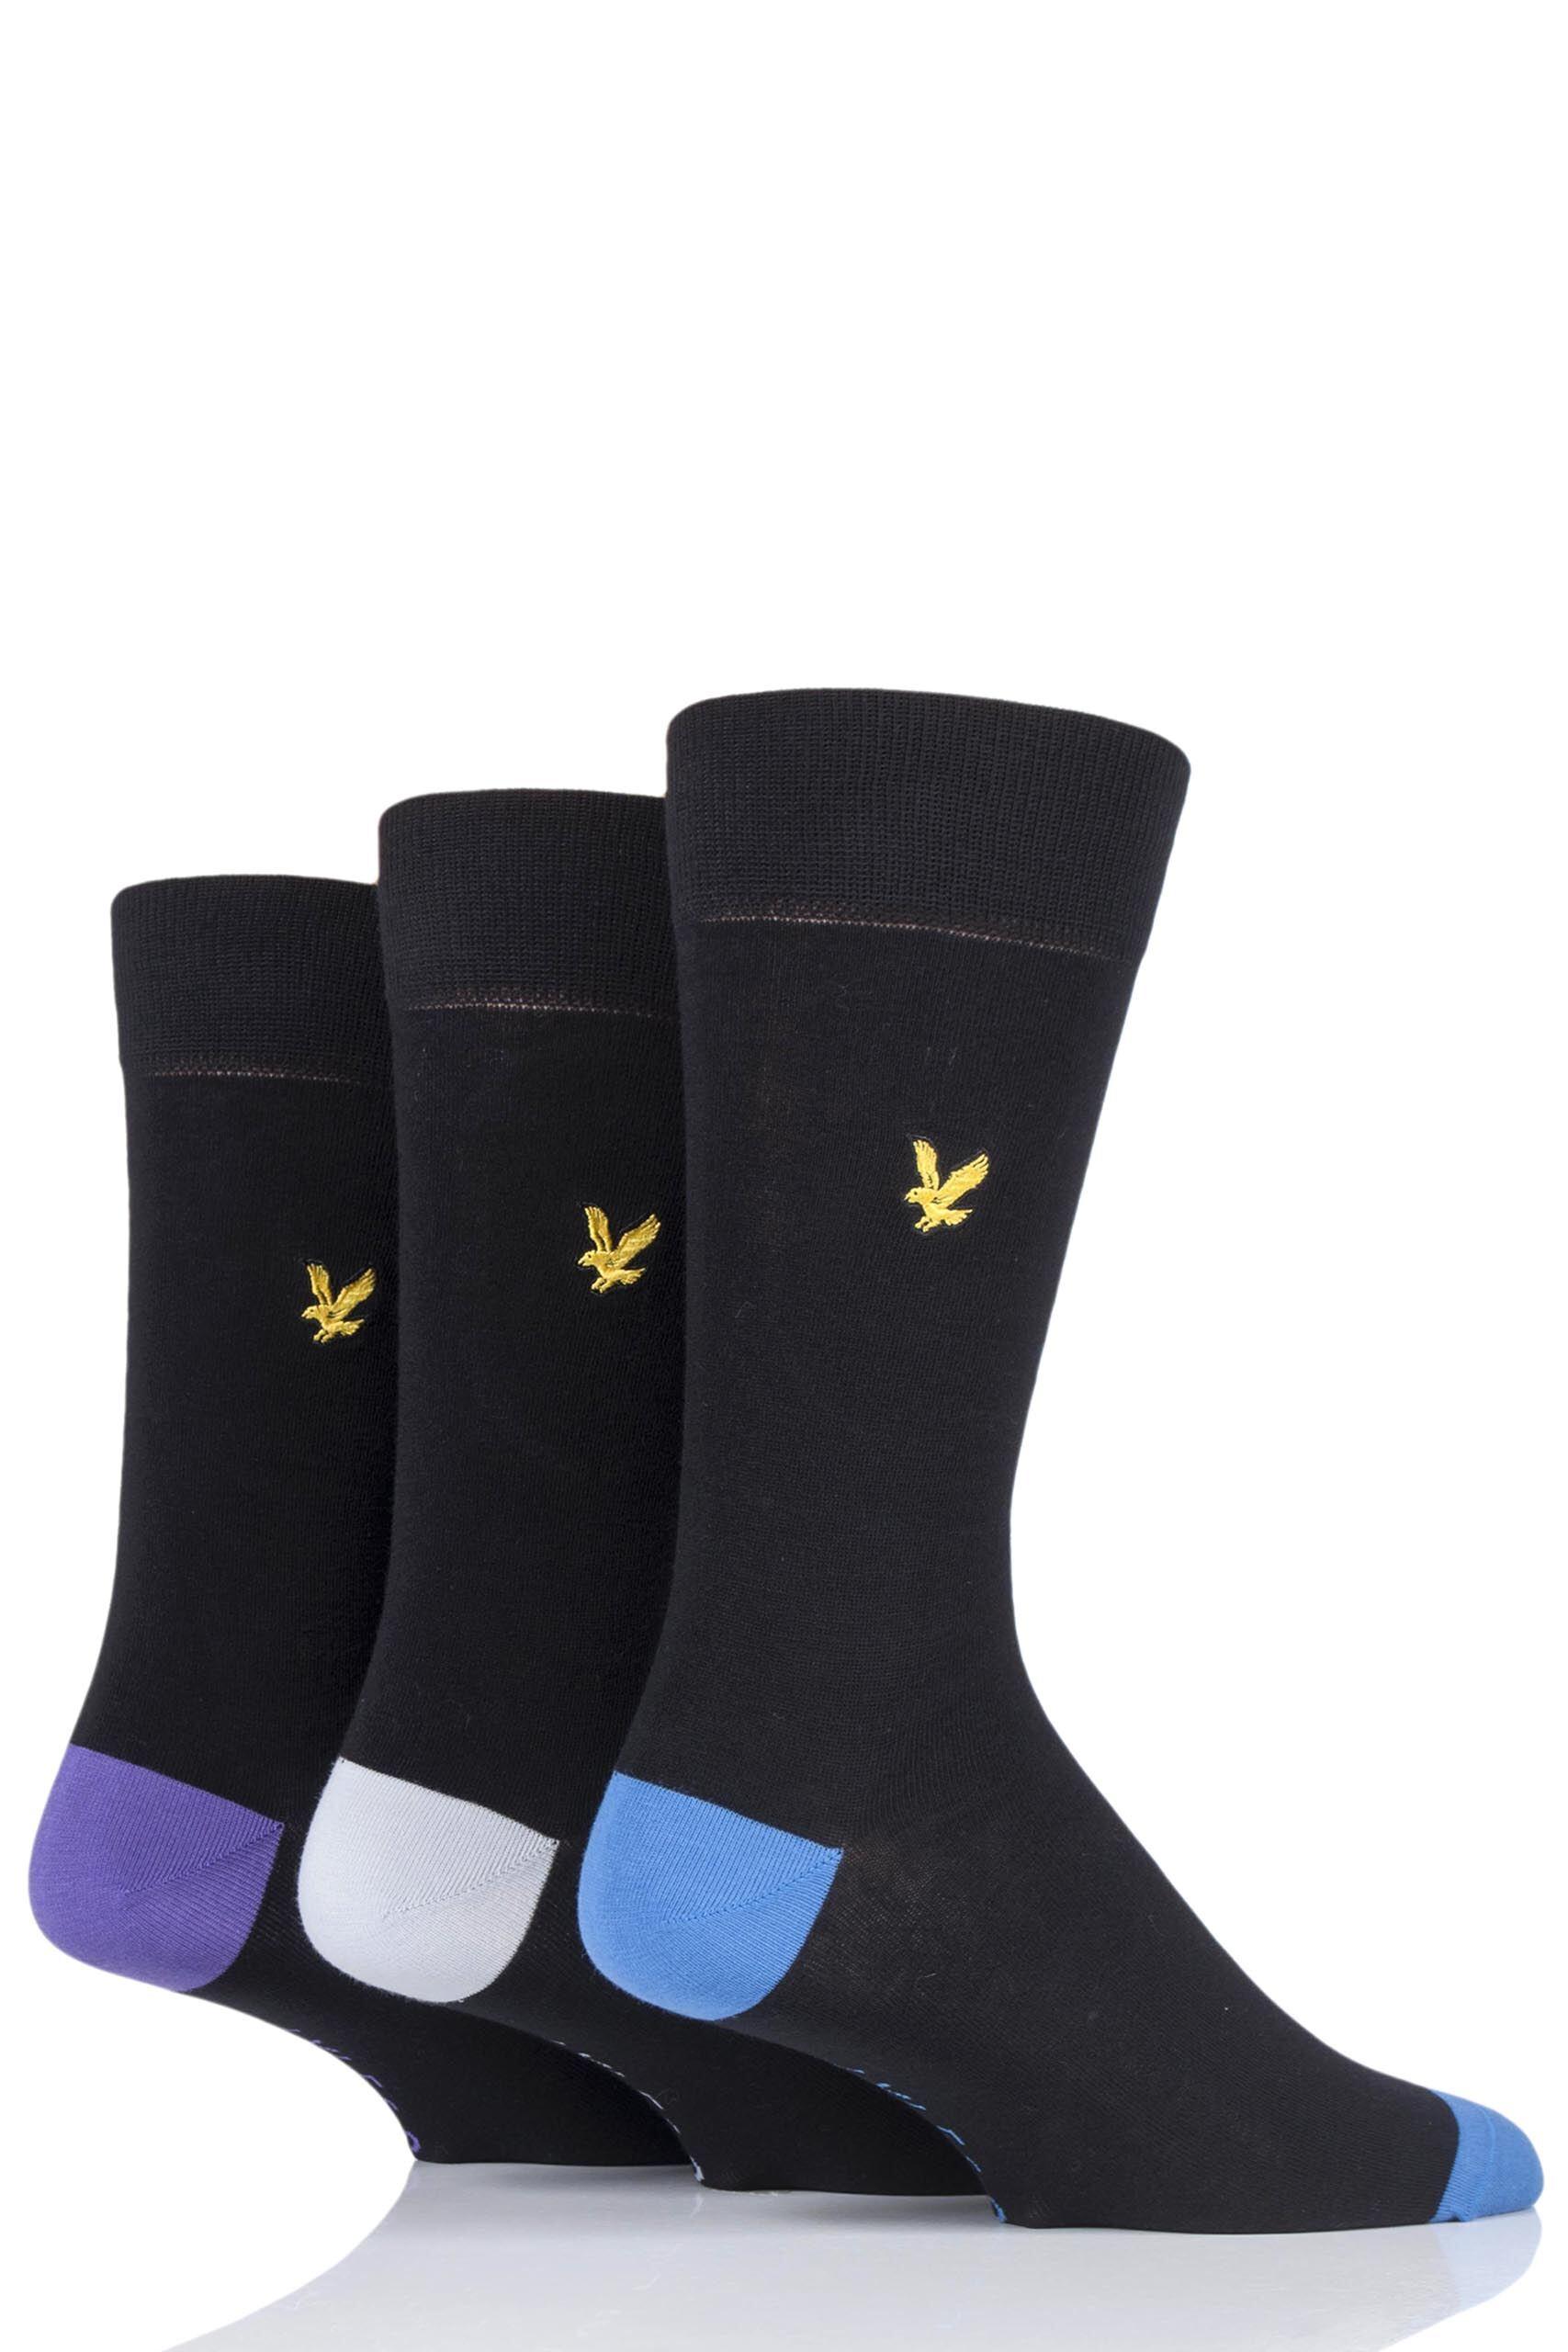 Image of 3 Pair Black / Grey Kennedy Contrast Heel and Toe Cotton Socks Men's 7-11 Mens - Lyle & Scott